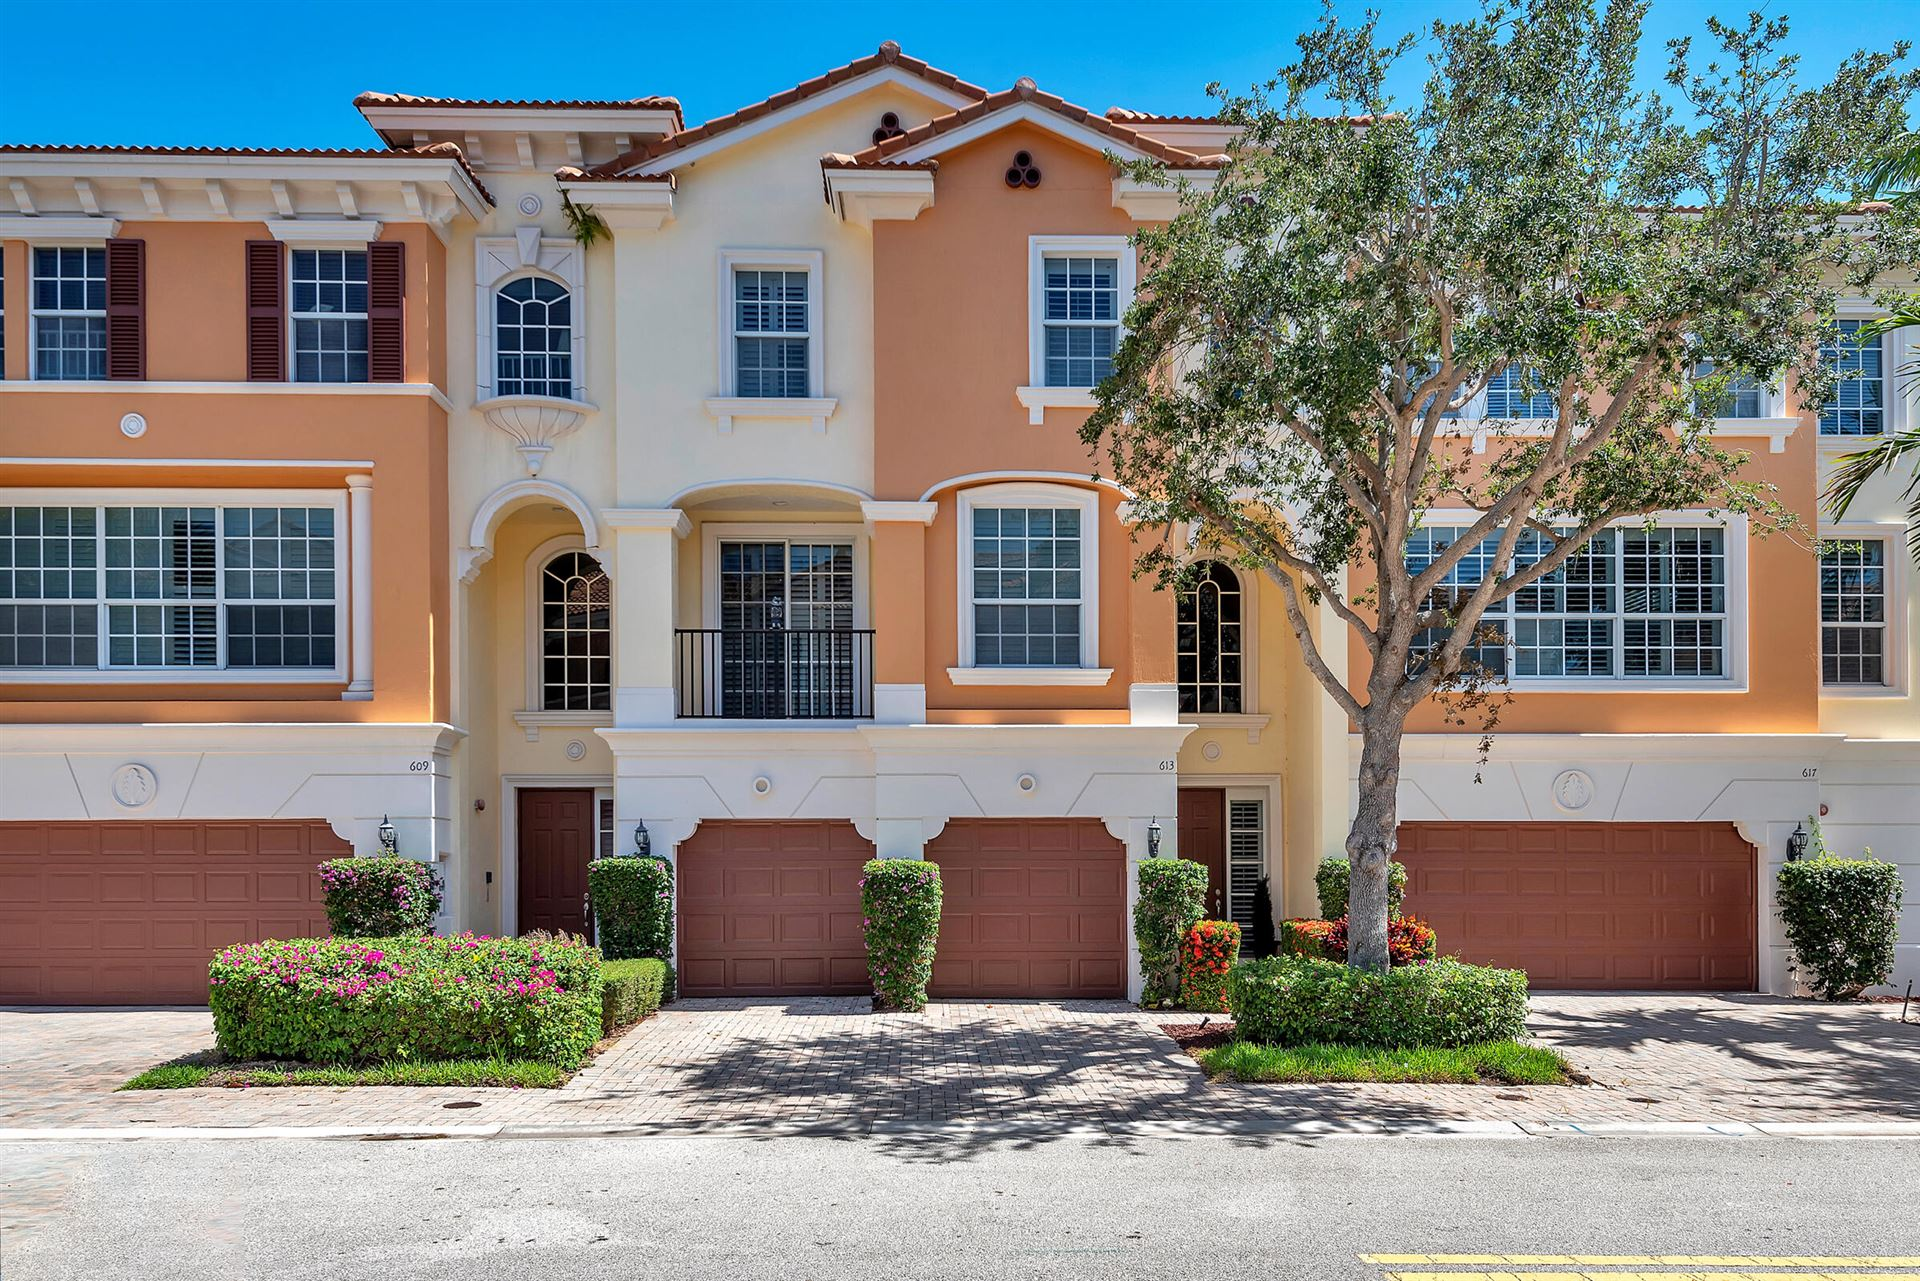 613 NE Francesca Lane, Boca Raton, FL 33487 - MLS#: RX-10722500